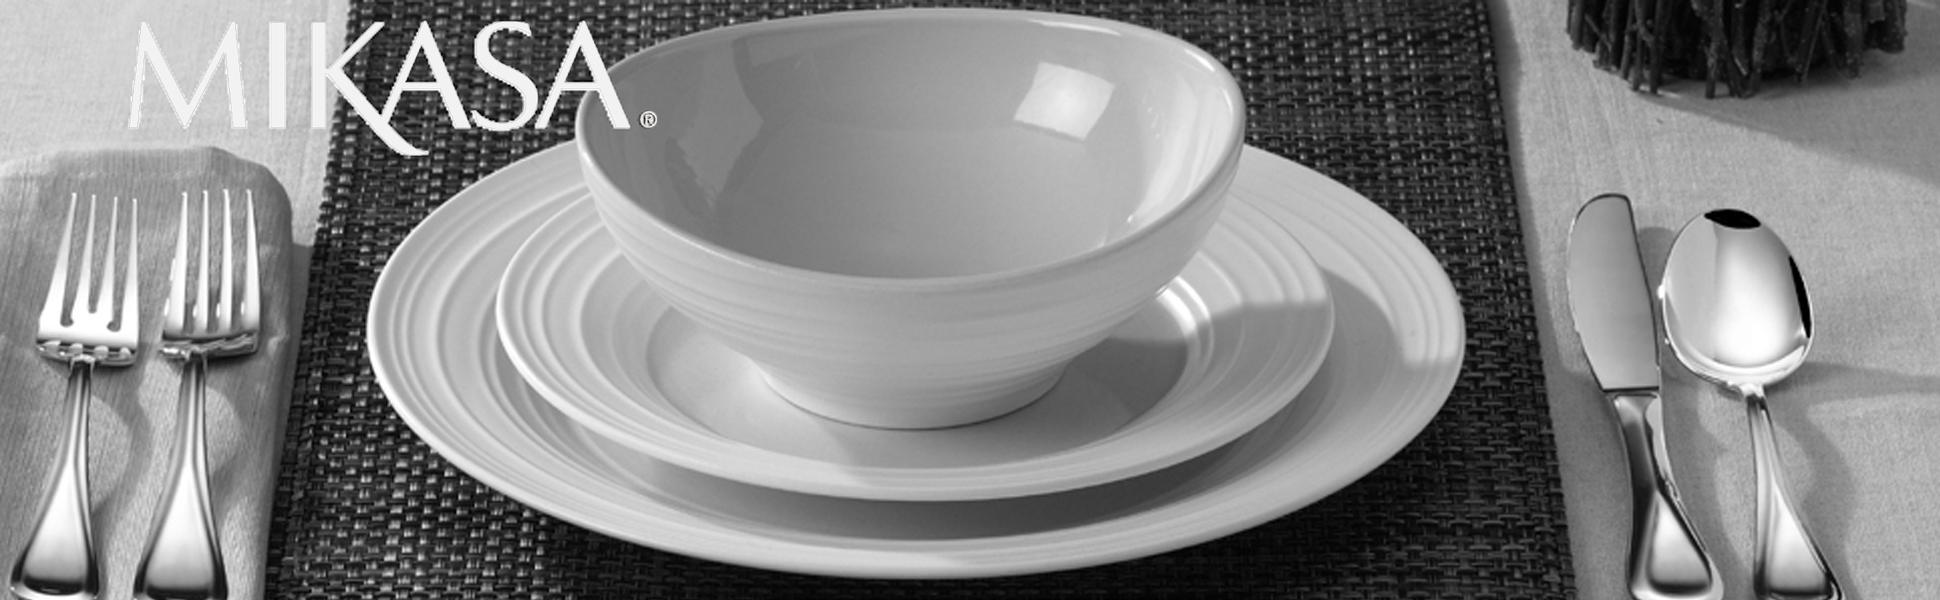 Mikasa Swirl Collection & Amazon.com: Mikasa Swirl White 20-Piece Dinnerware Set Service ...